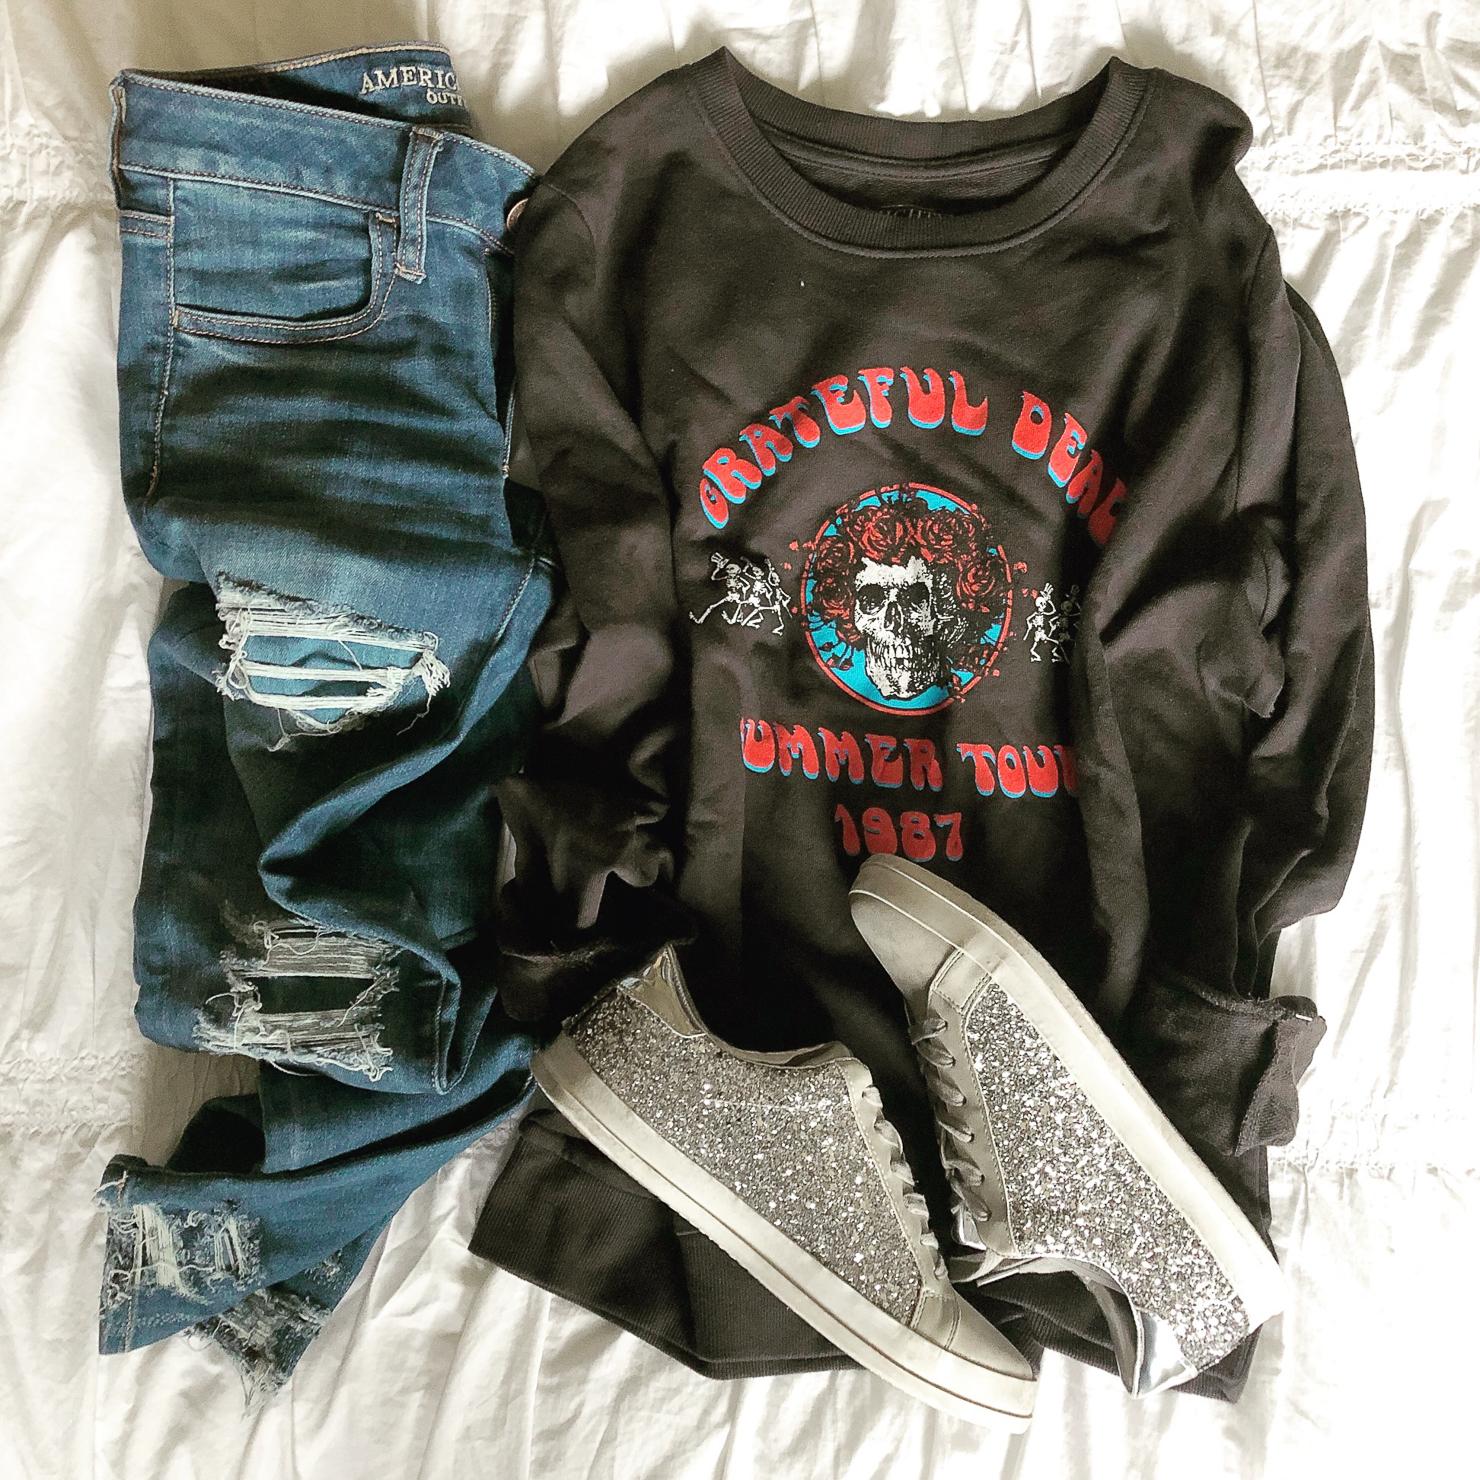 grateful-dead-graphic-sweatshirt-mossimo-glitter-sneakers